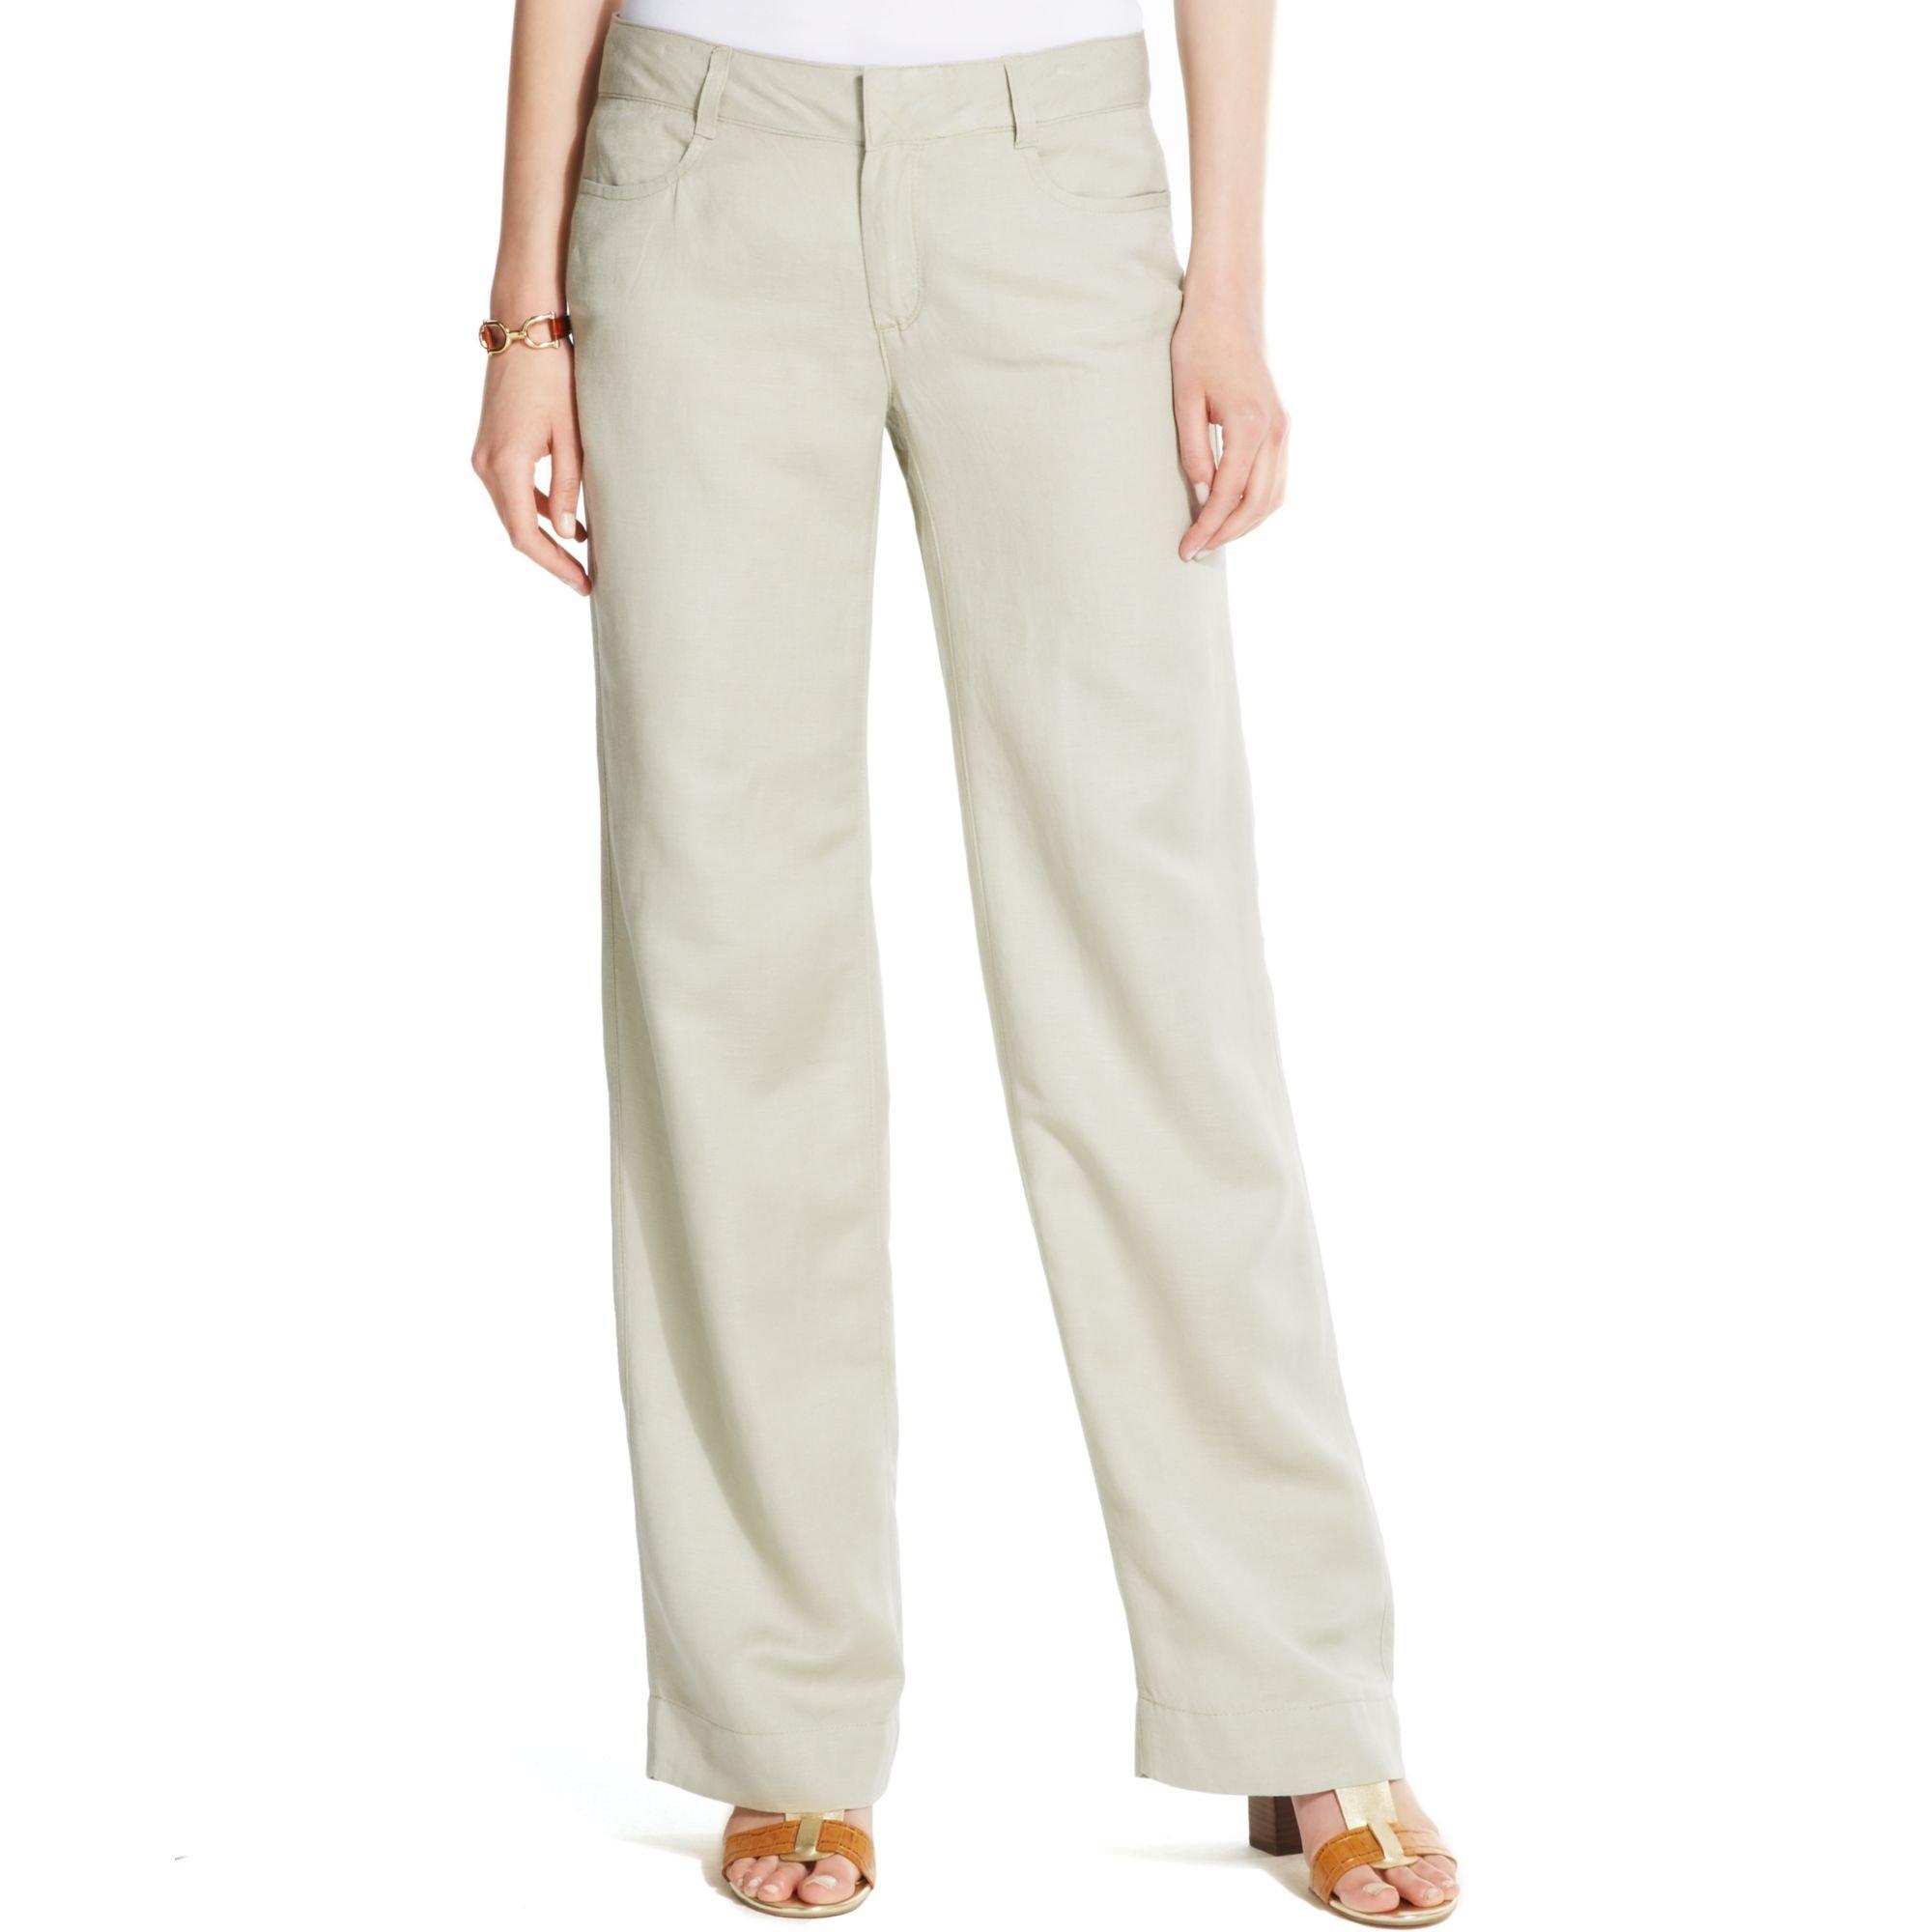 Elegant Women Women39s WideLeg Linen Pants  Khaki  Old Navy  Polyvore